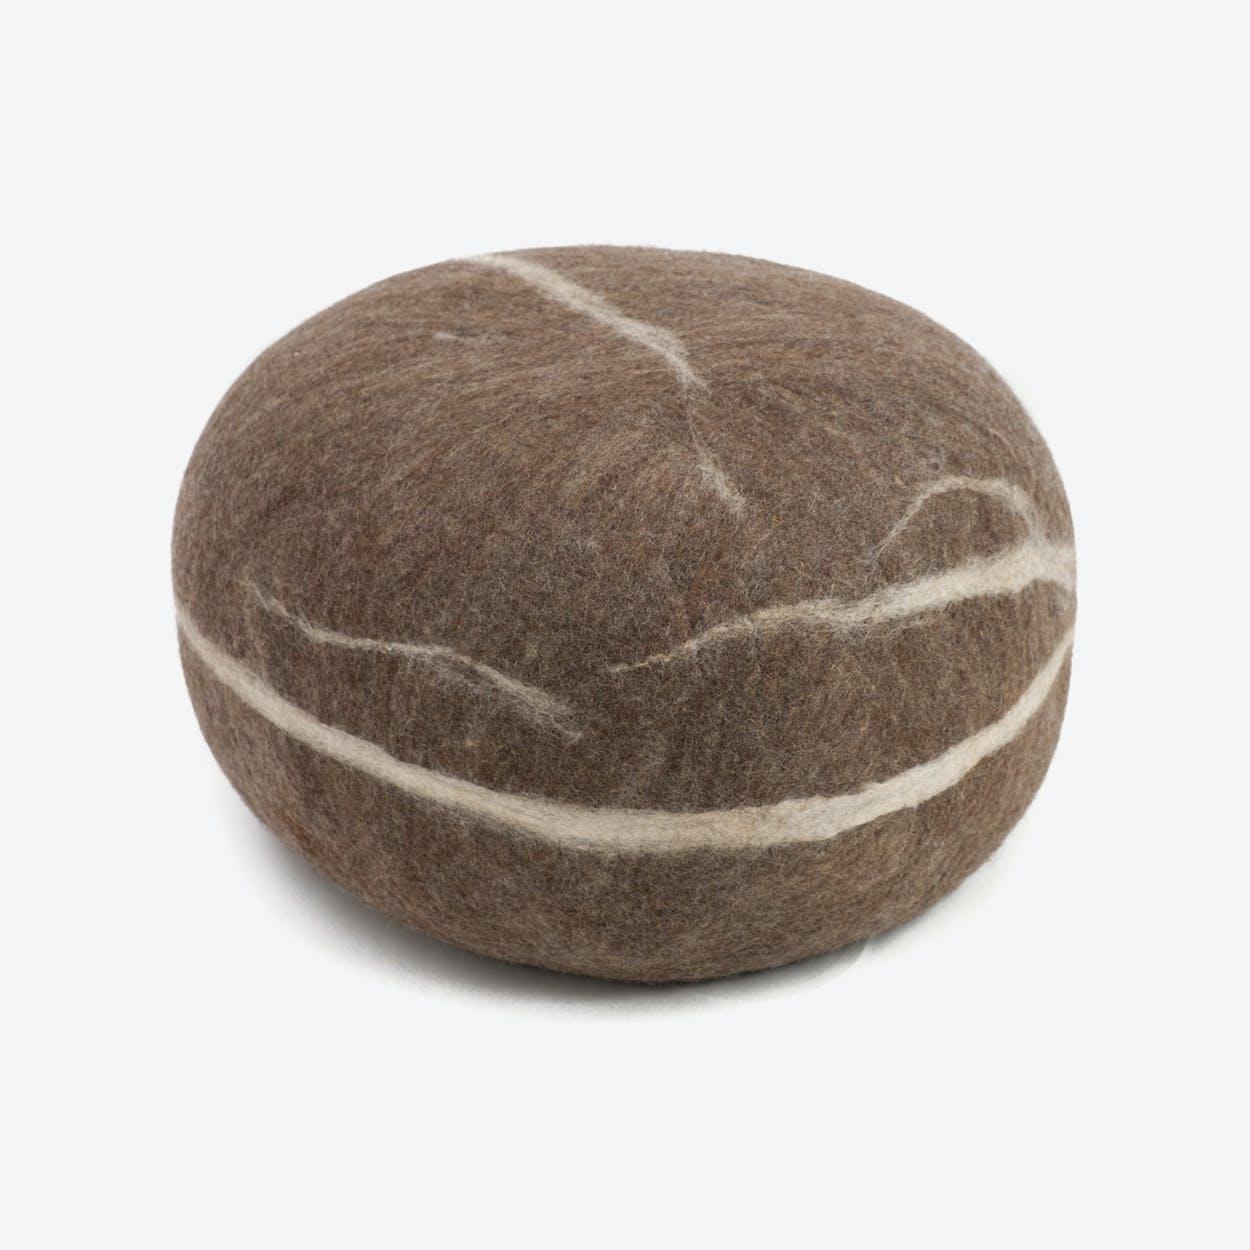 Alwin-Felt Sitting Stone in Brown